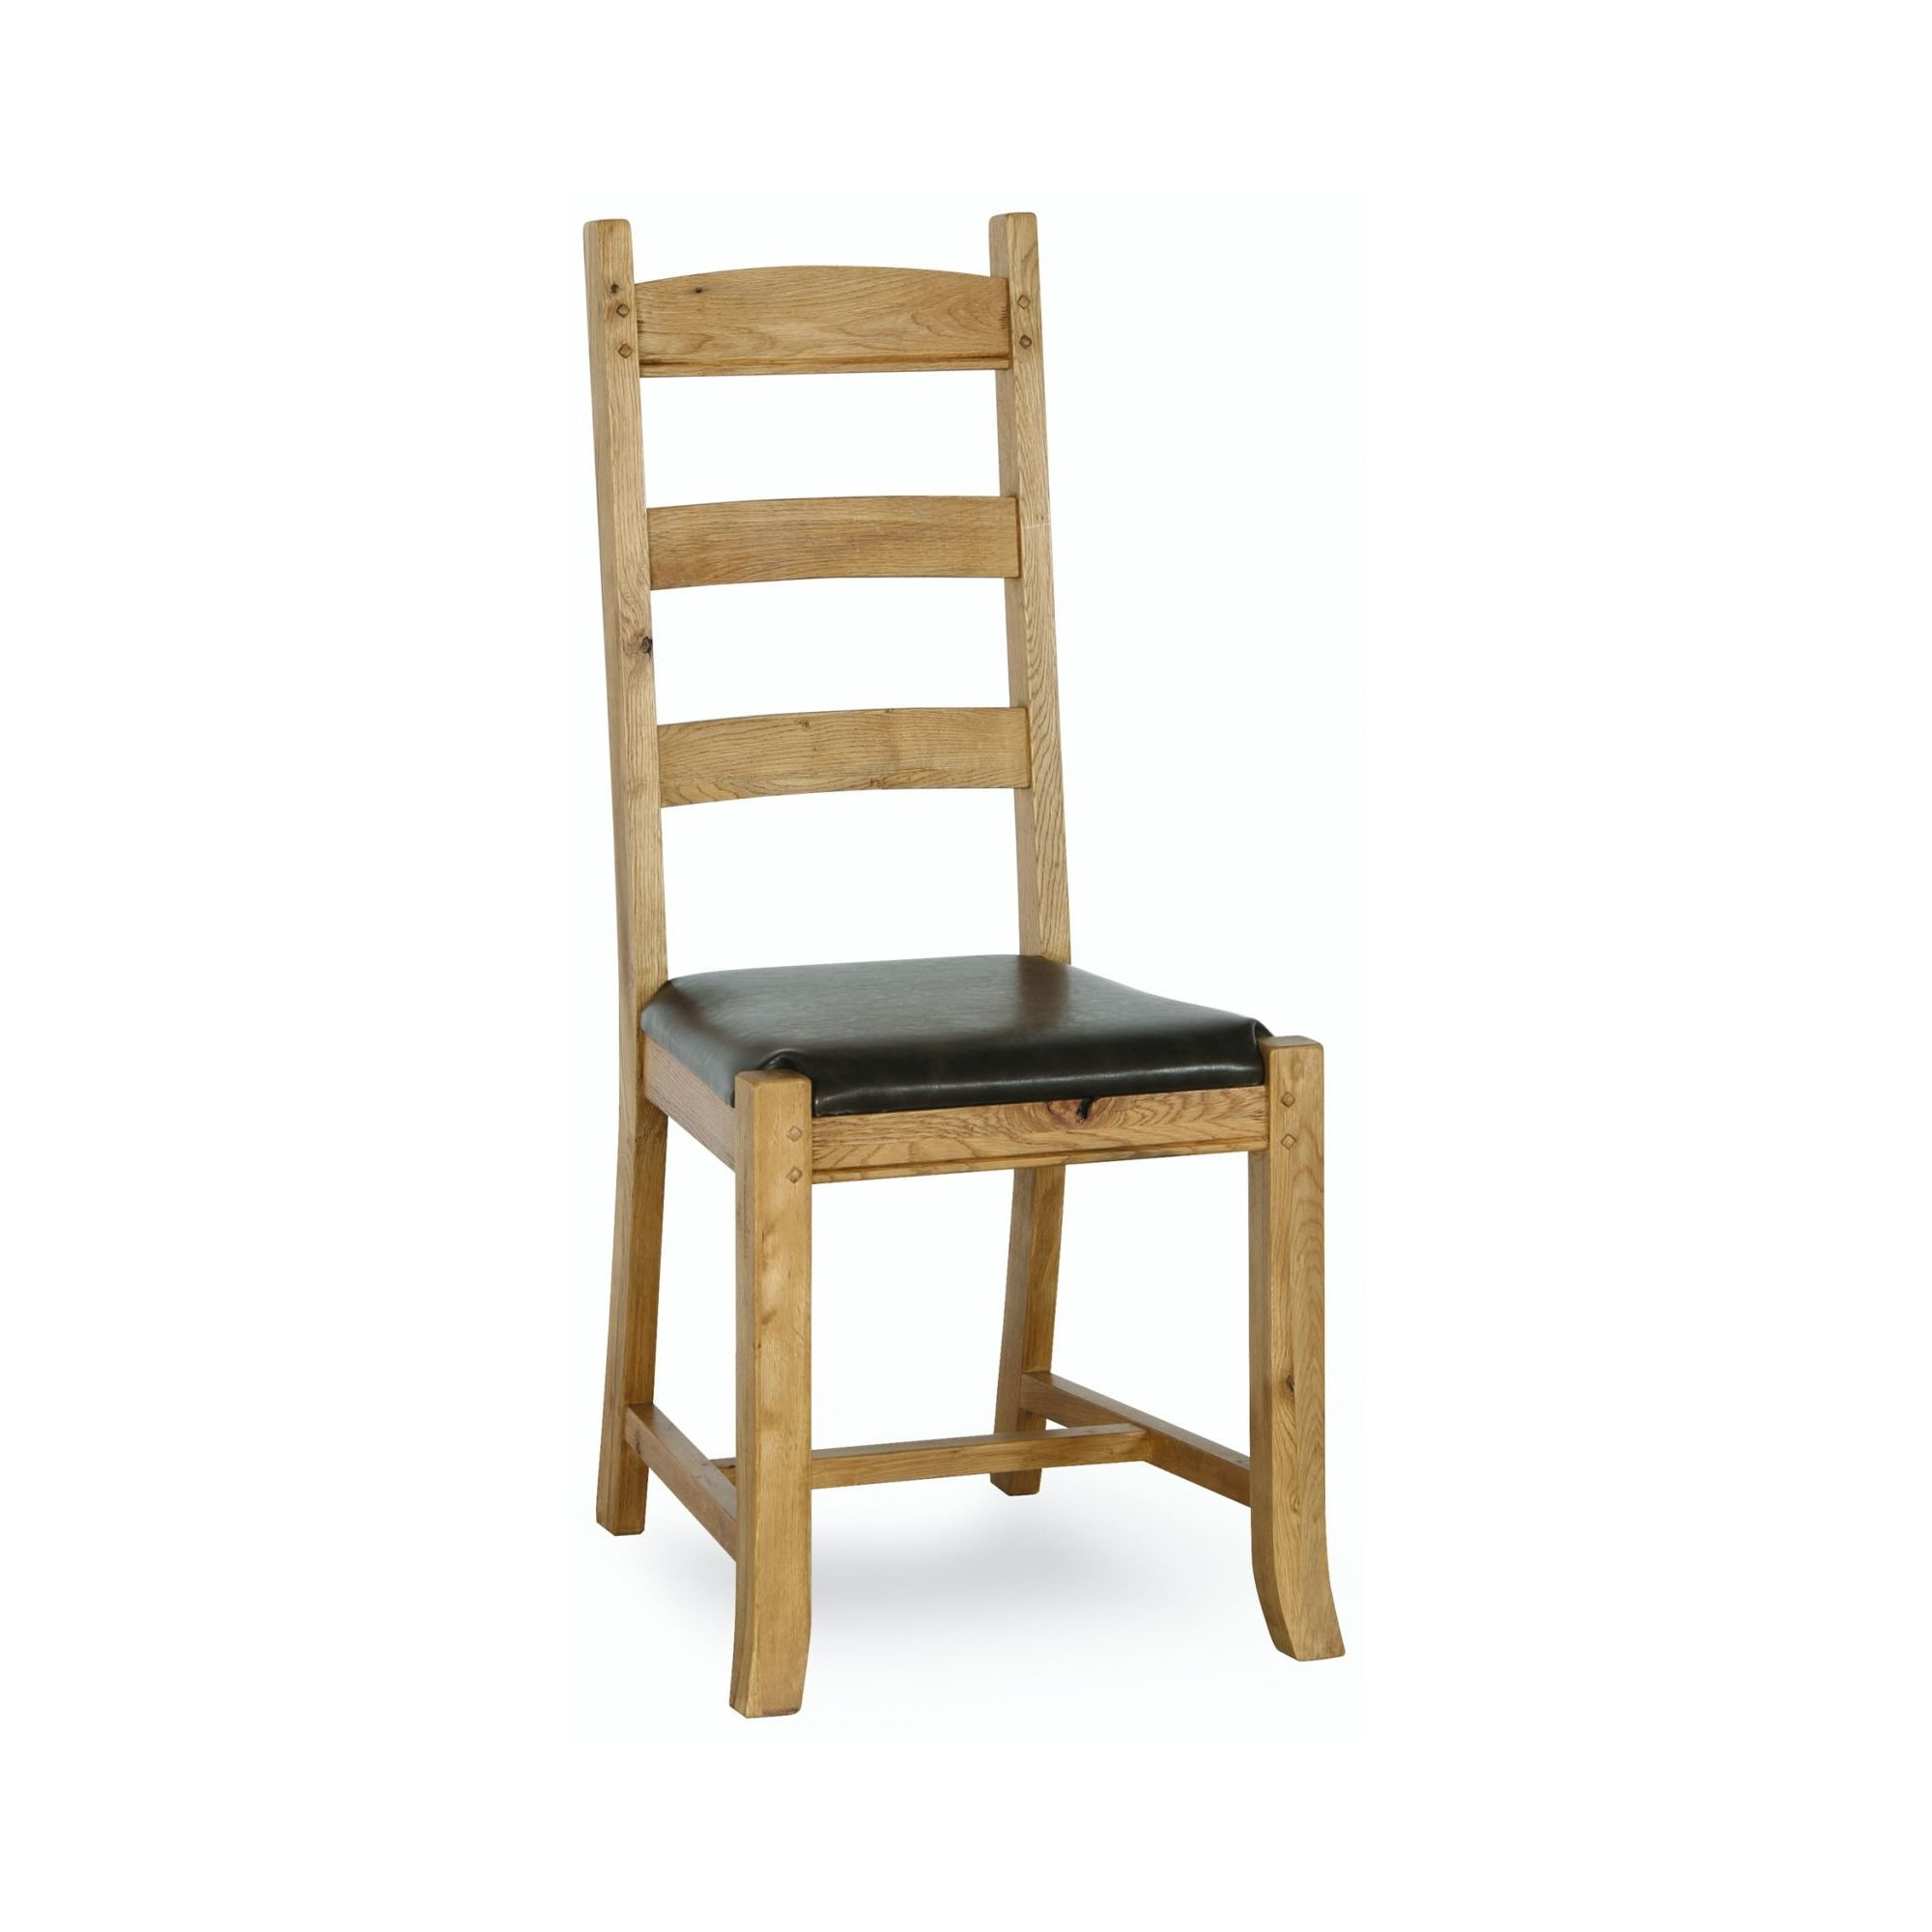 Kelburn Furniture Veneto Rustic Oak Dining Chair (Set of 2)